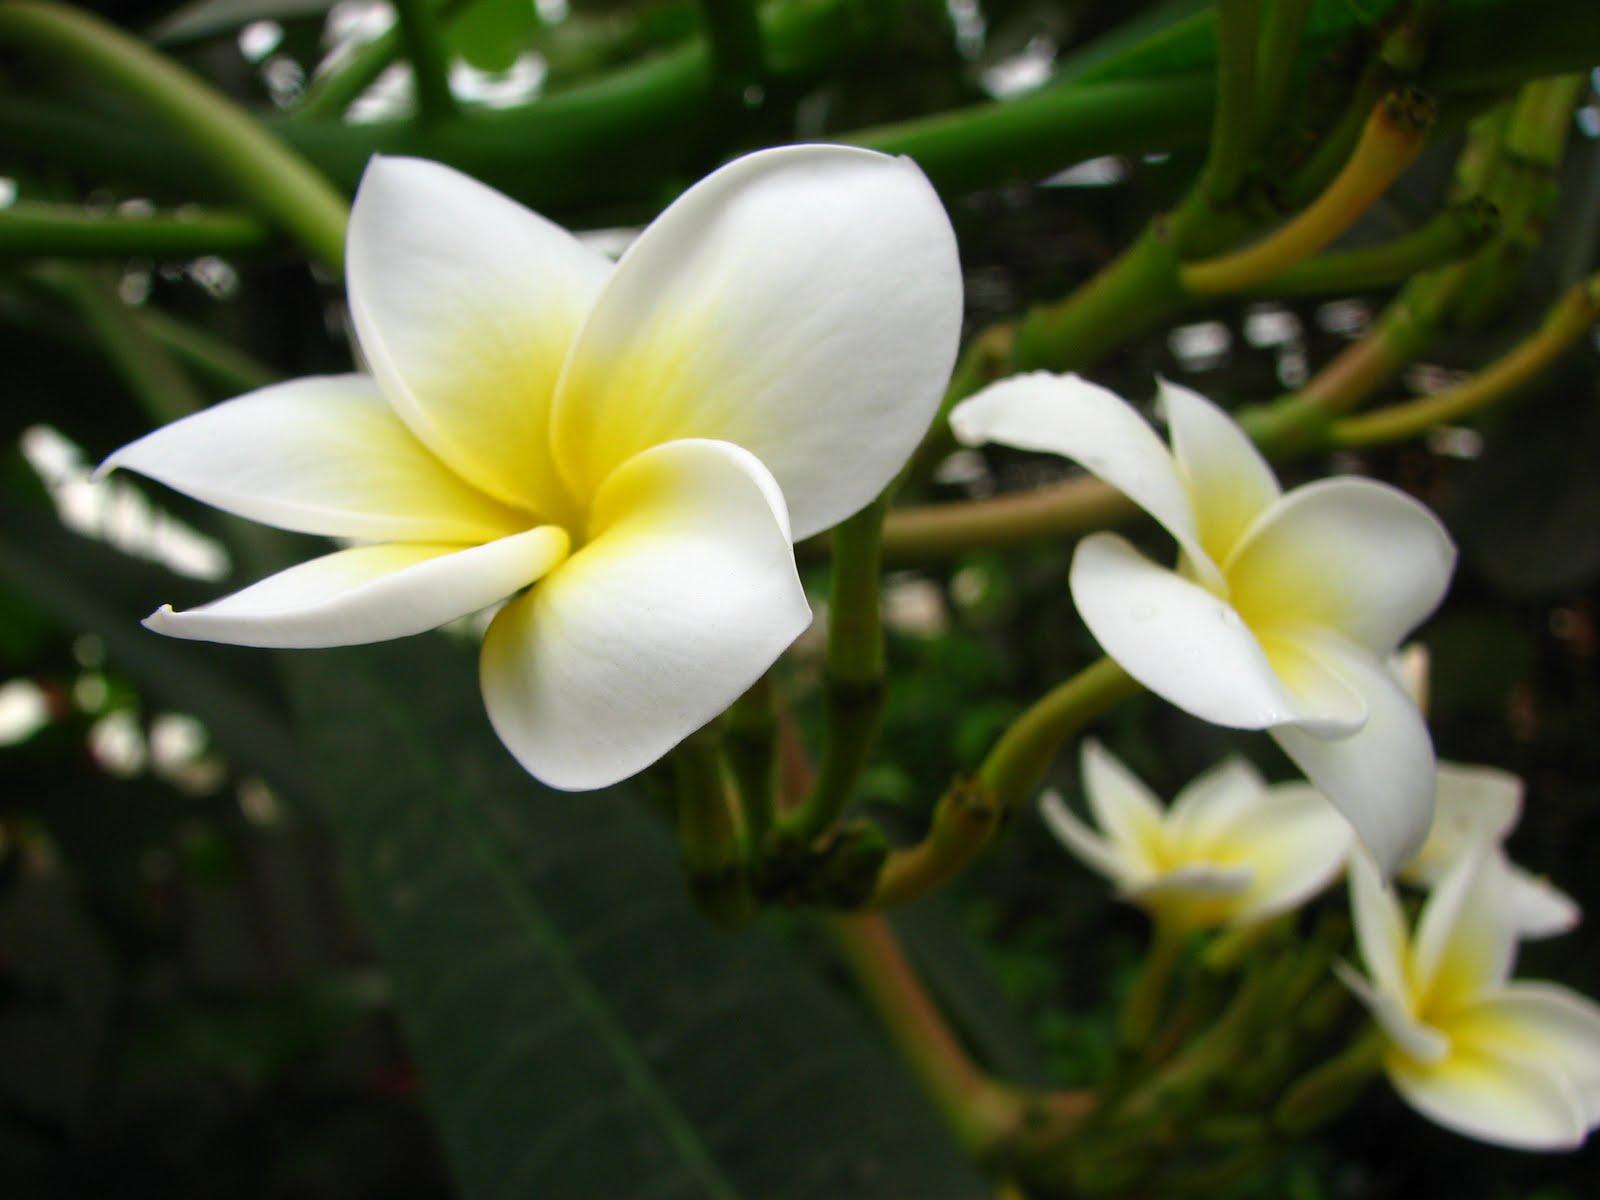 Philippine White Flower Gardening Flower And Vegetables